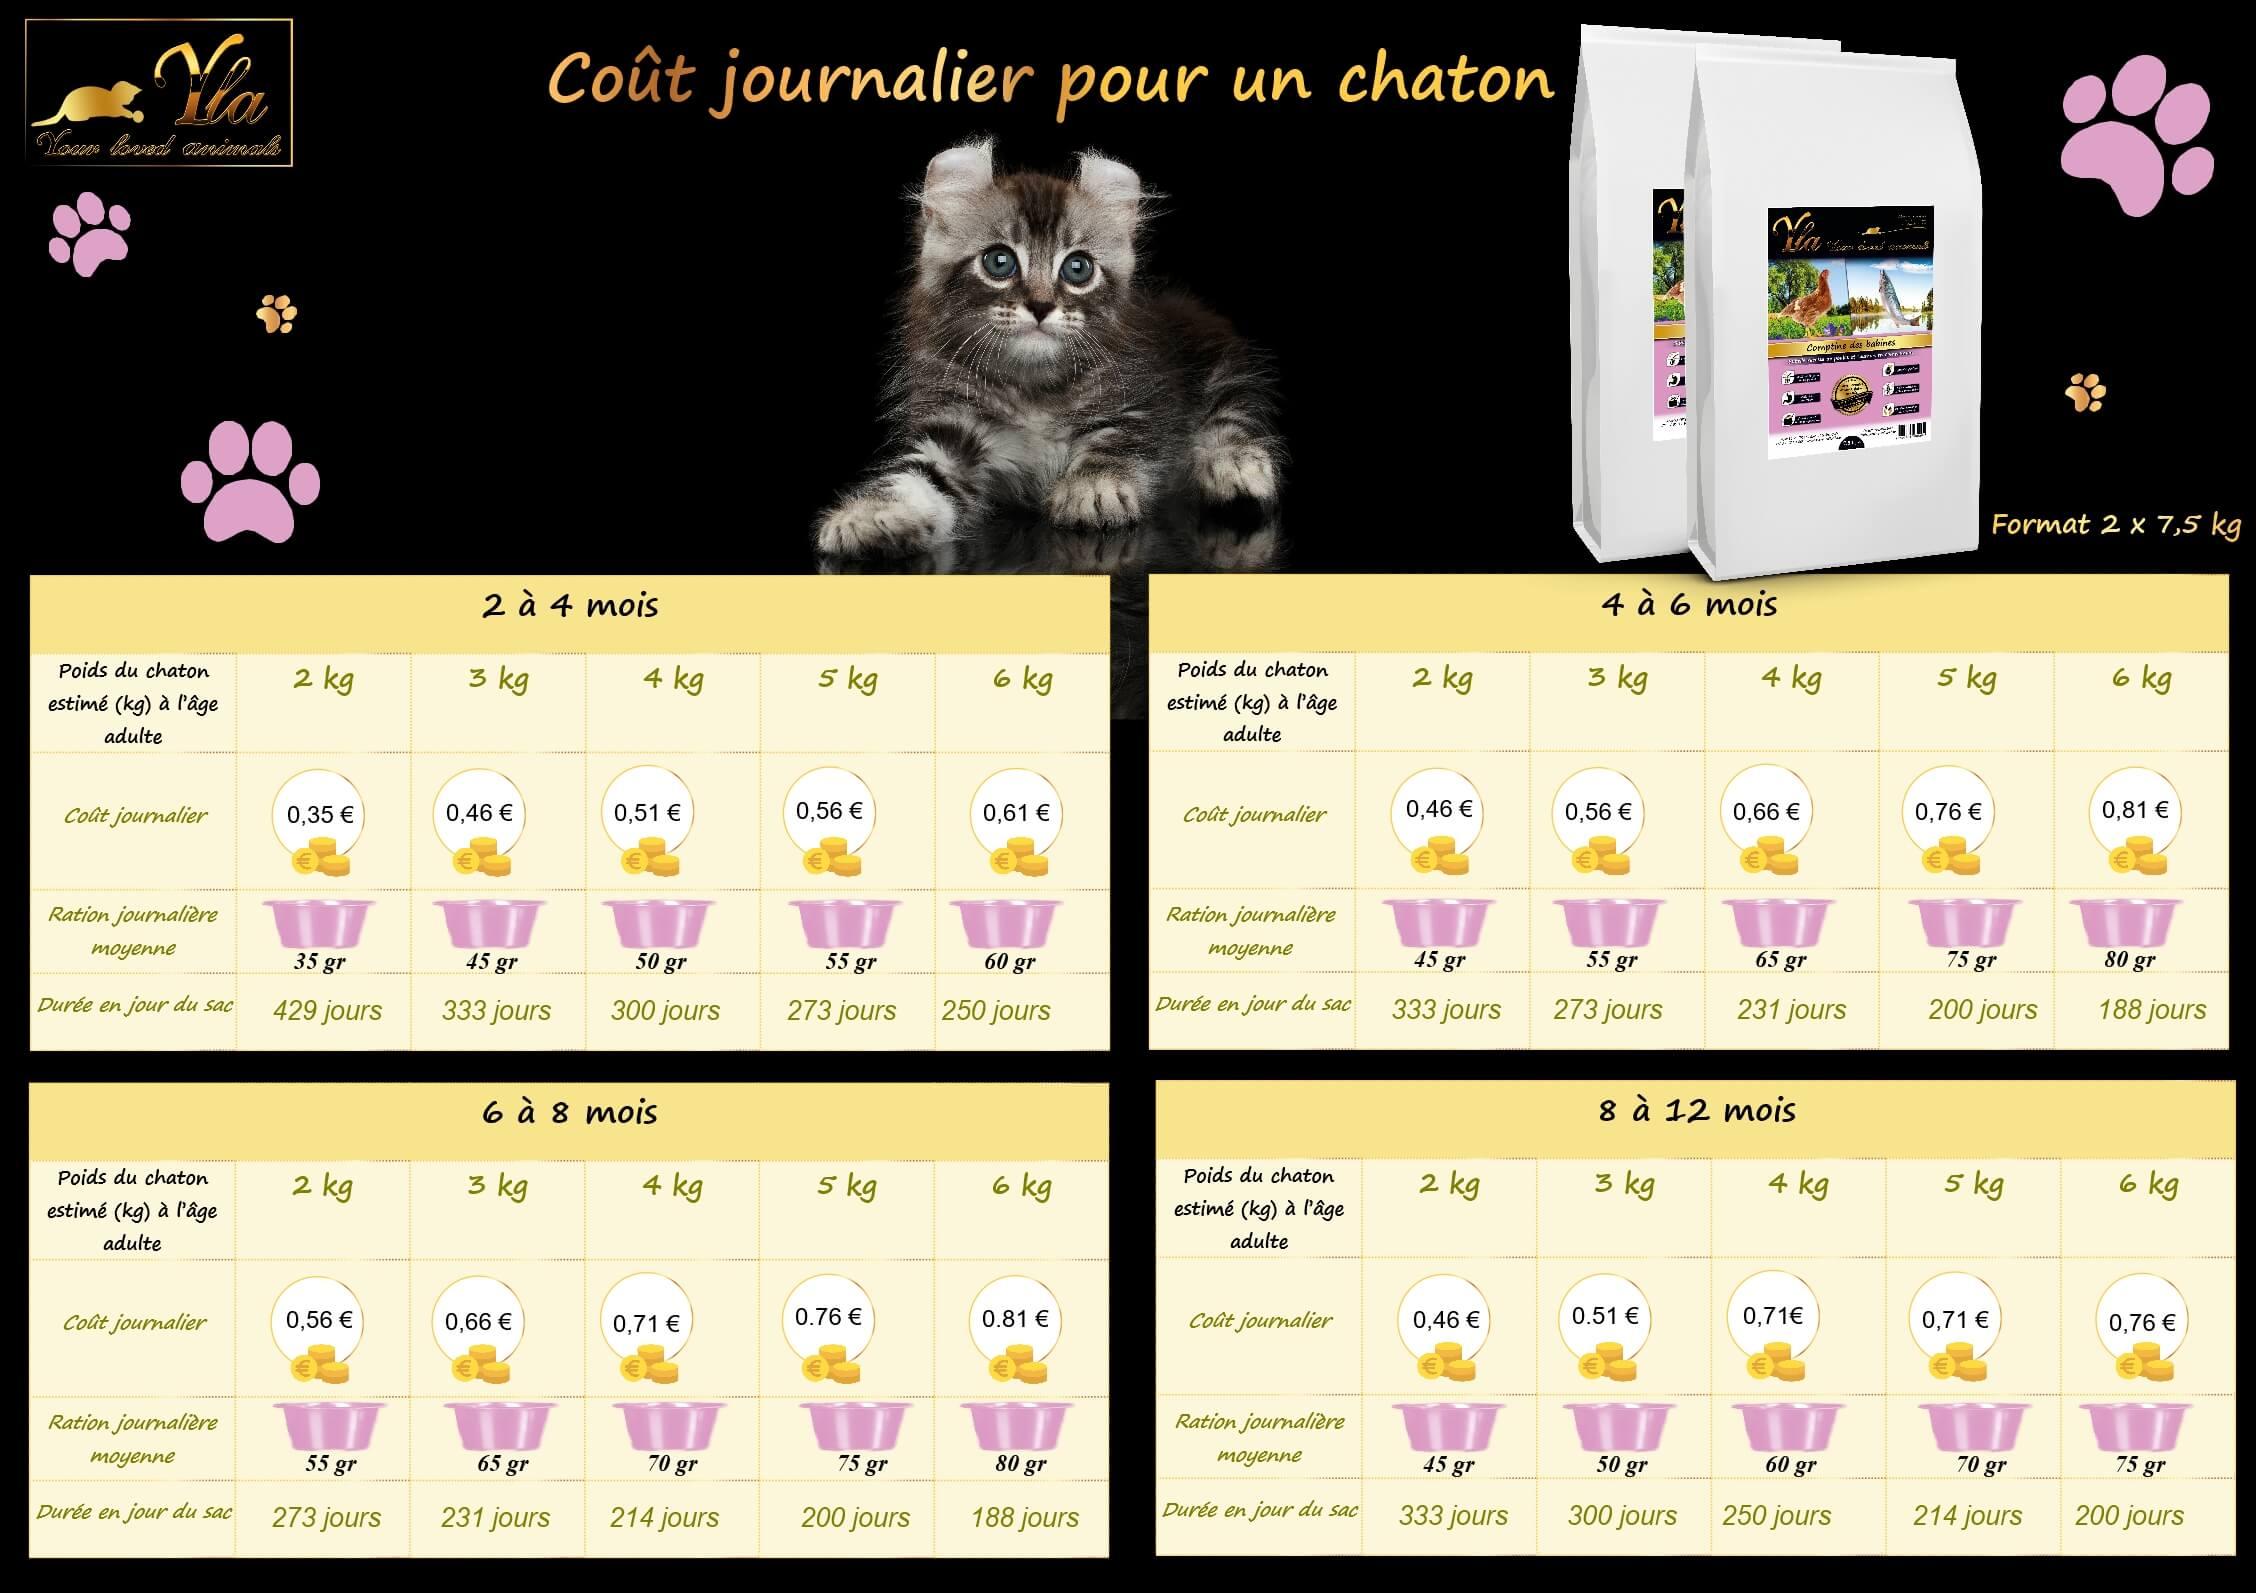 cout-journalier-alimentation-sans-cereale-chaton